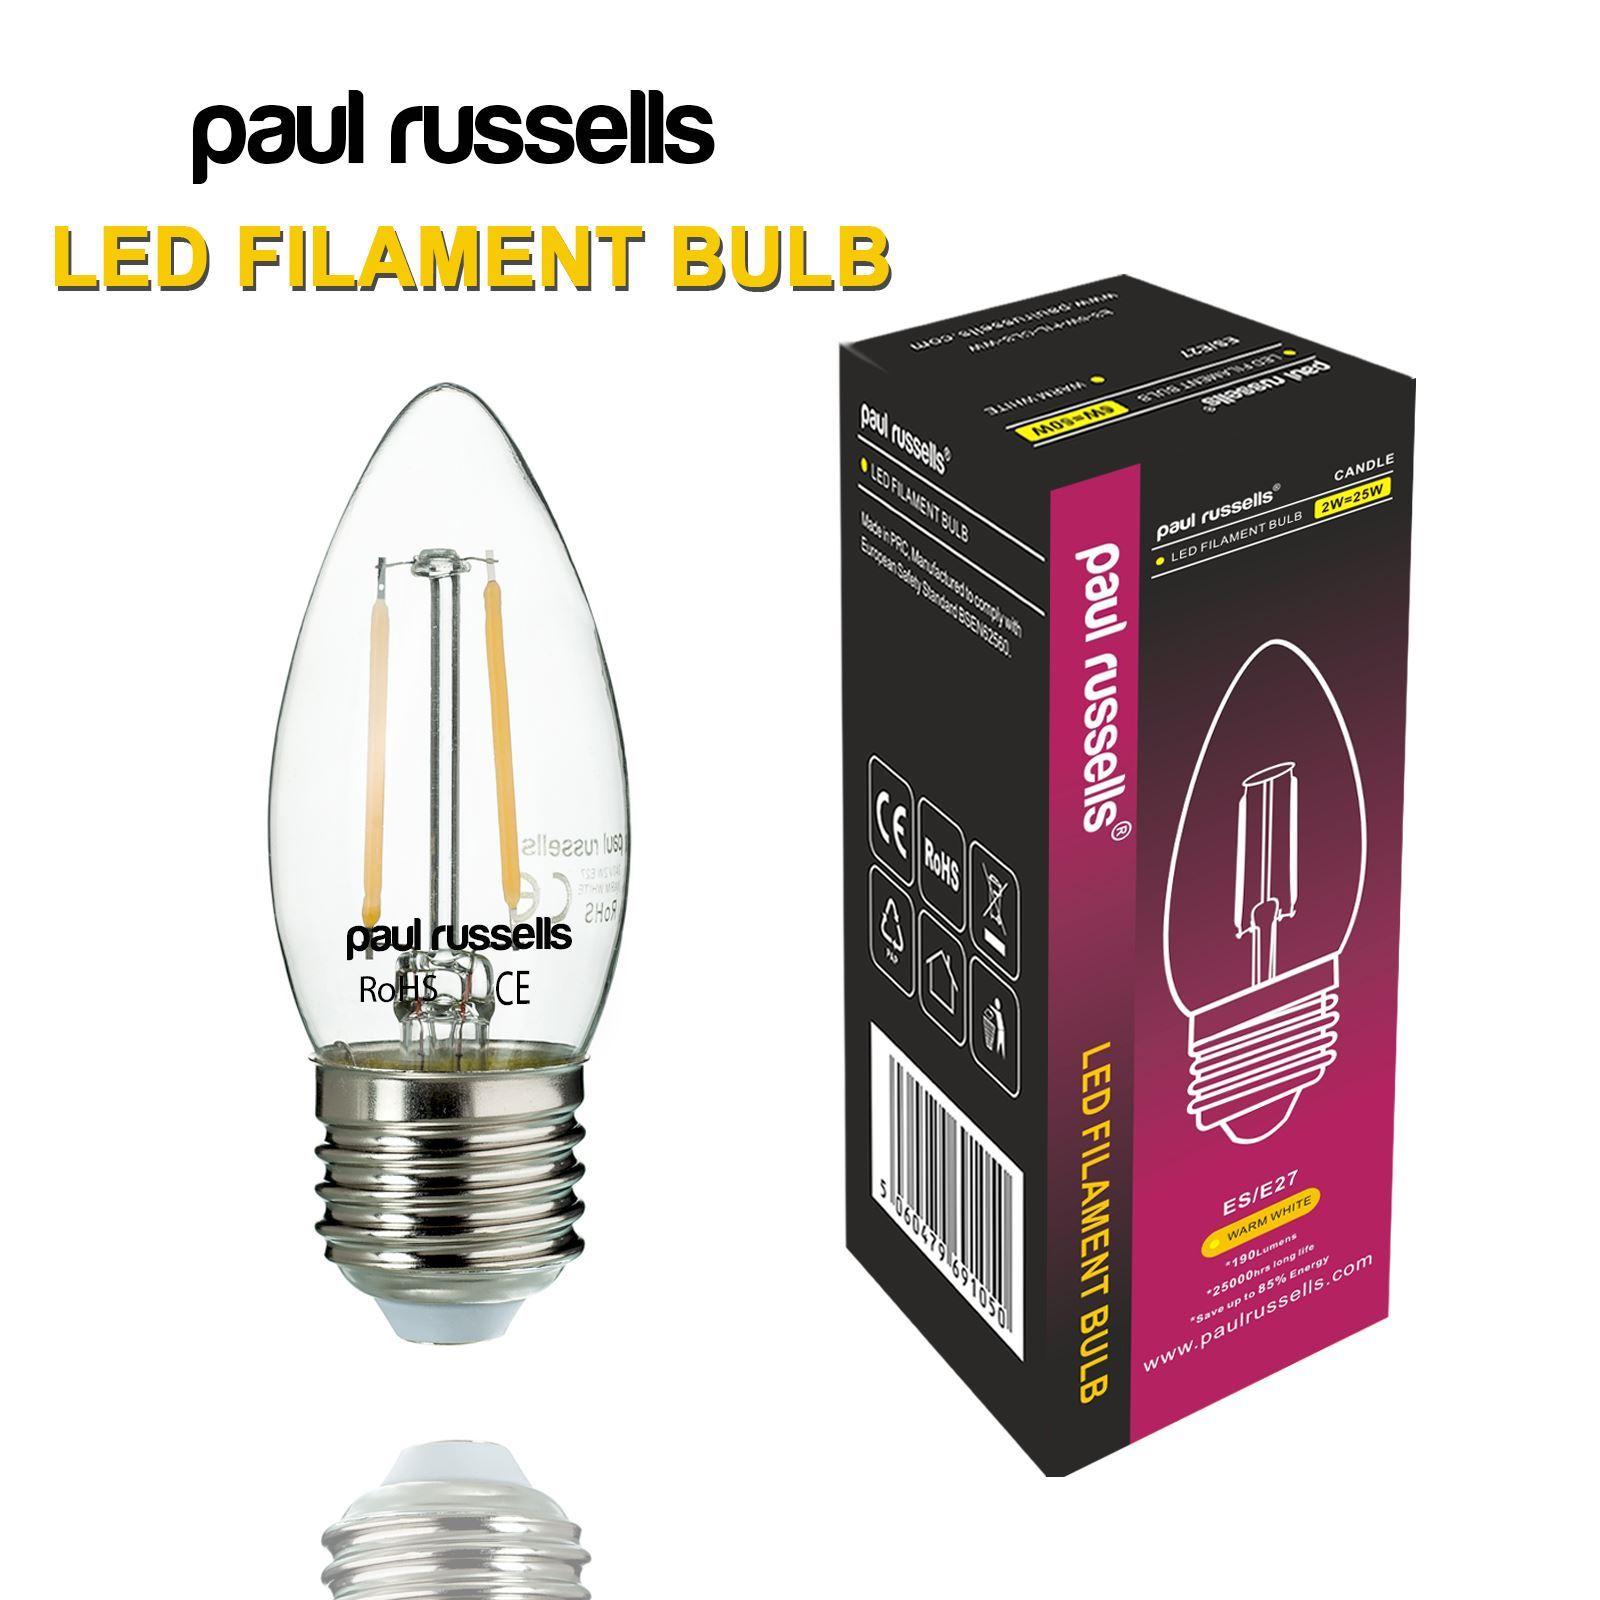 2w 25w 4w 40w e14 e27 b22 led filament candle light bulb lamp ebay. Black Bedroom Furniture Sets. Home Design Ideas